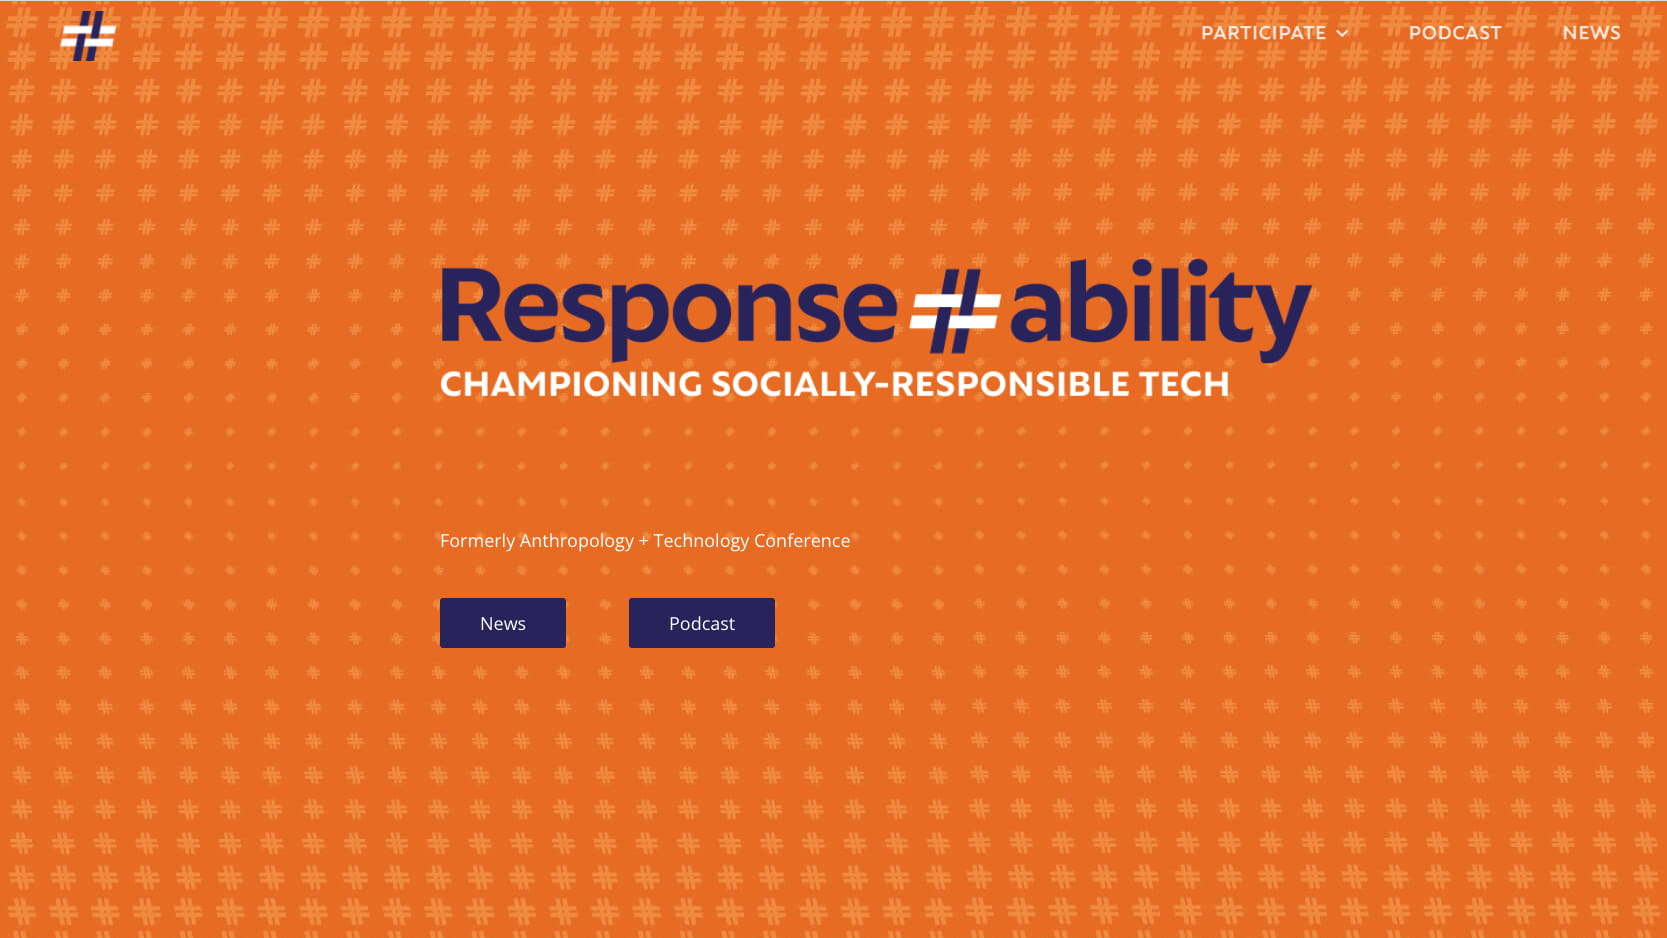 Response-ability Summit